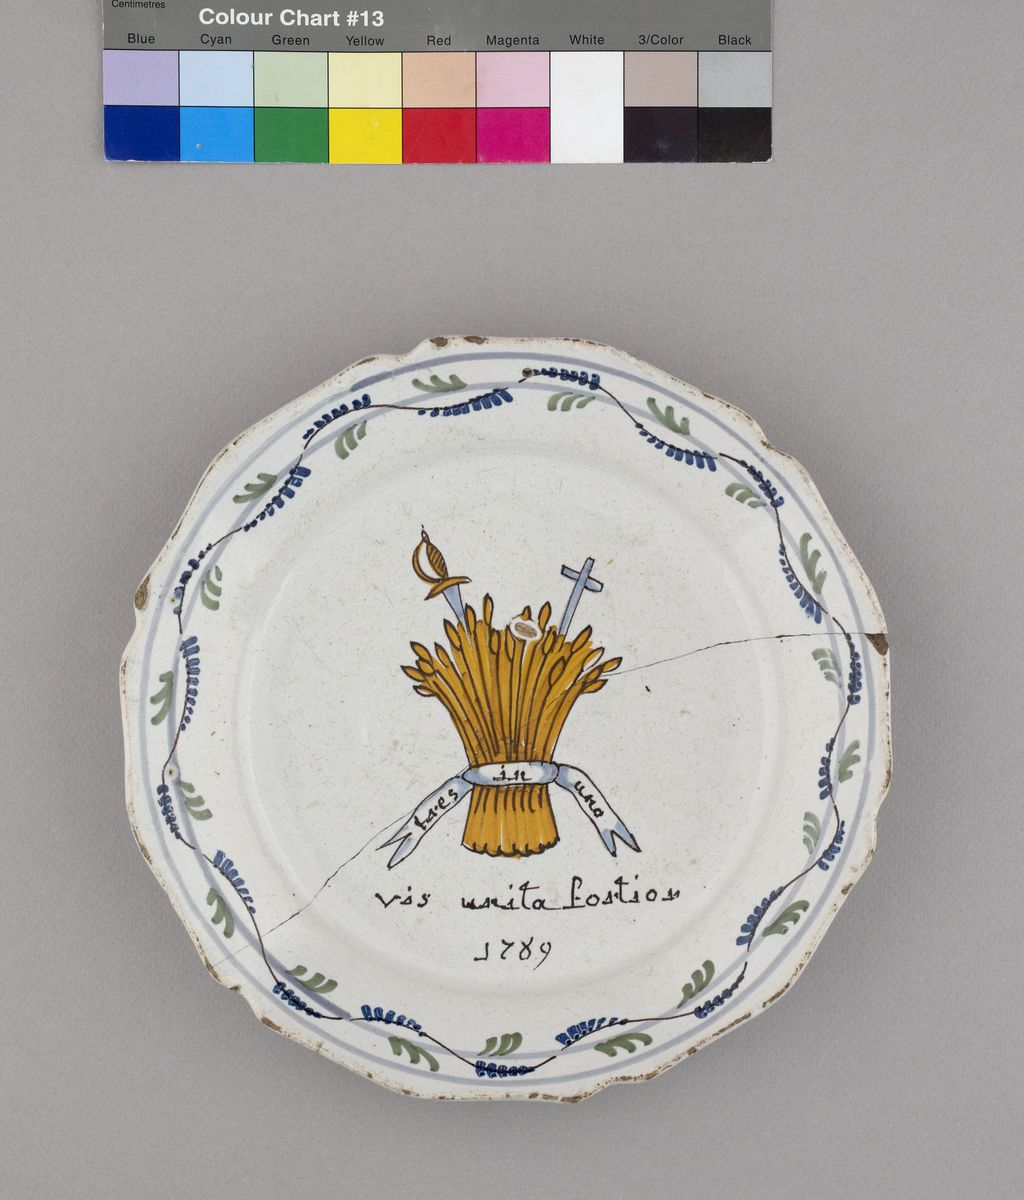 Vis Unita Fortior 1789 Céramique